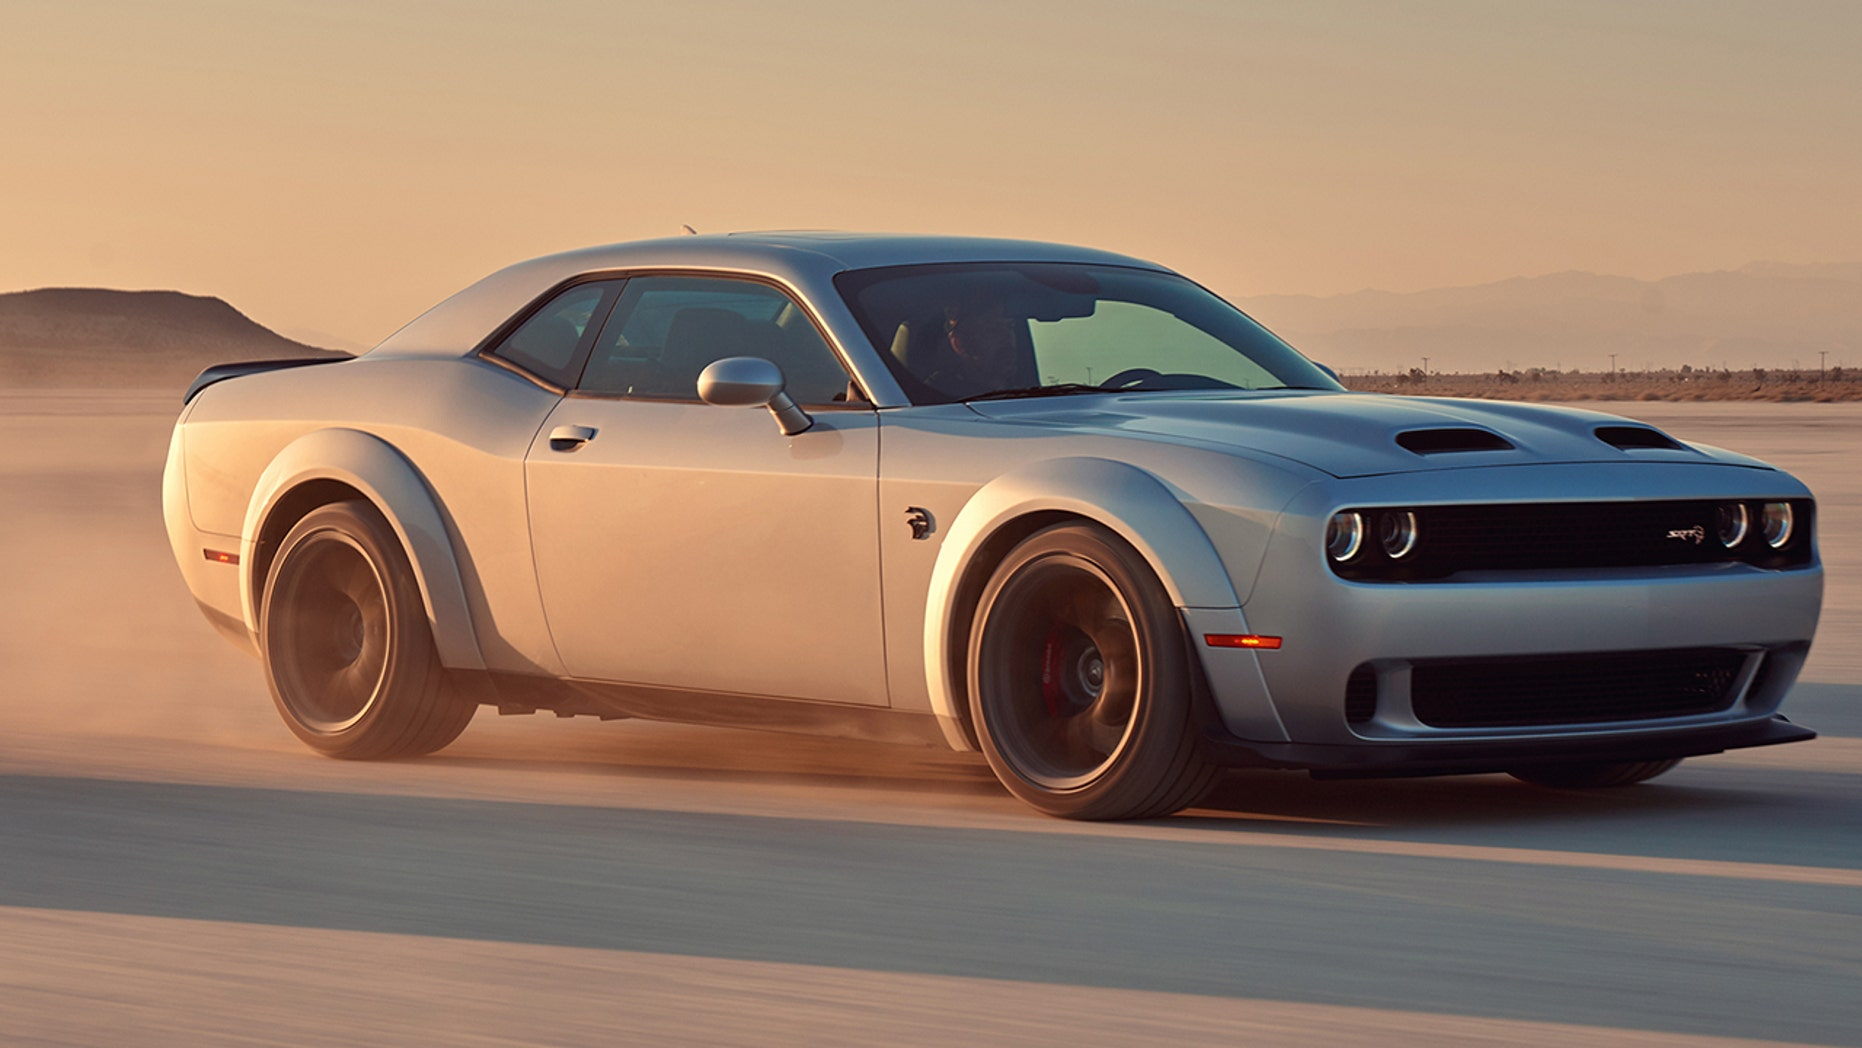 dodge demon hellcat redeye hp 2019 Dodge Challenger SRT Hellcat Redeye unveiled with